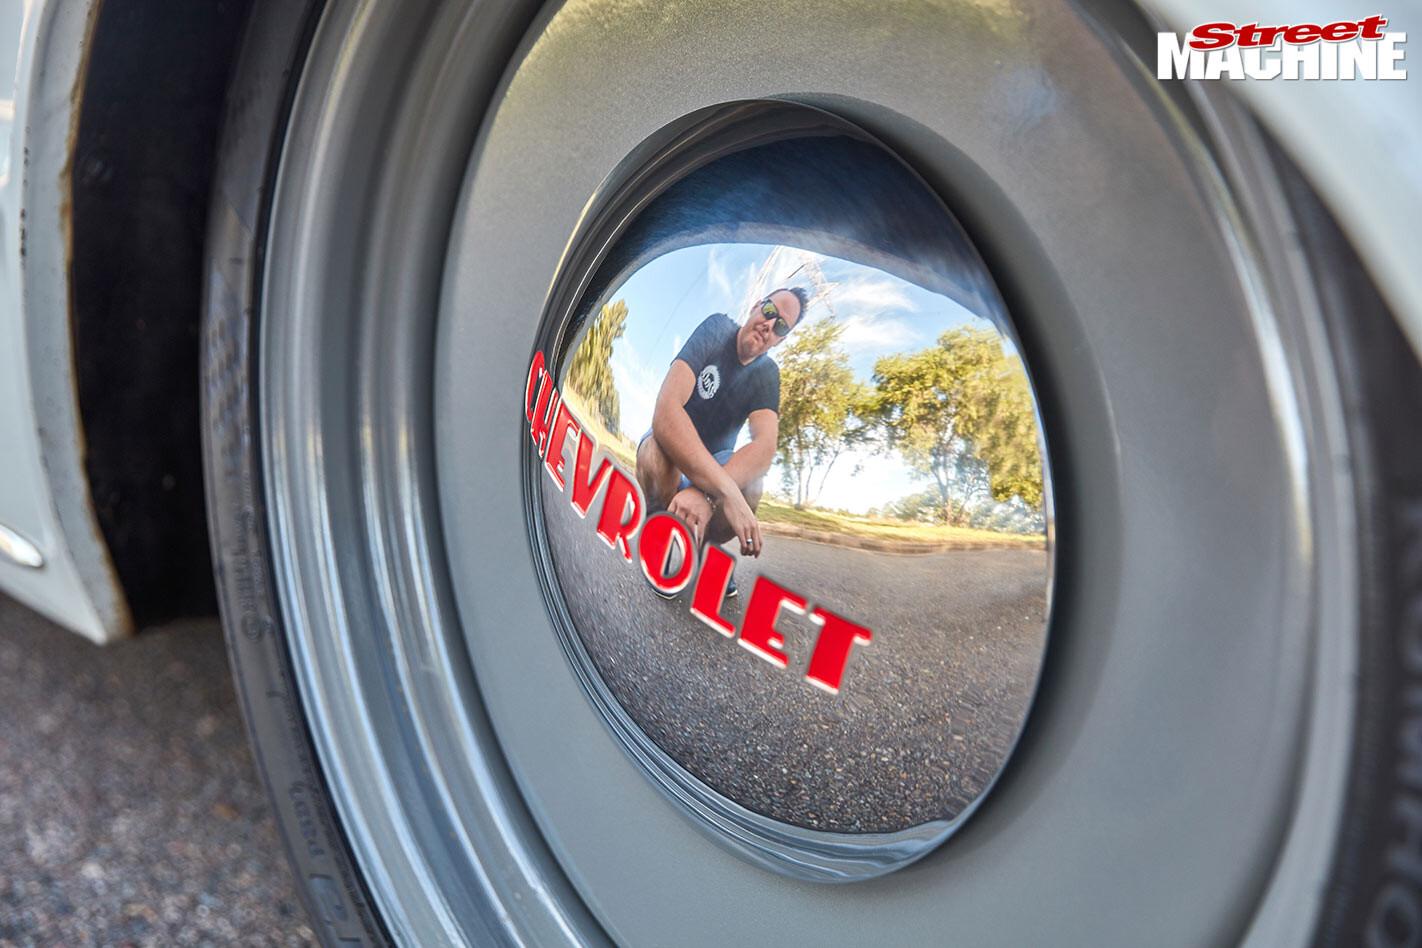 Chev Bel Air wheel